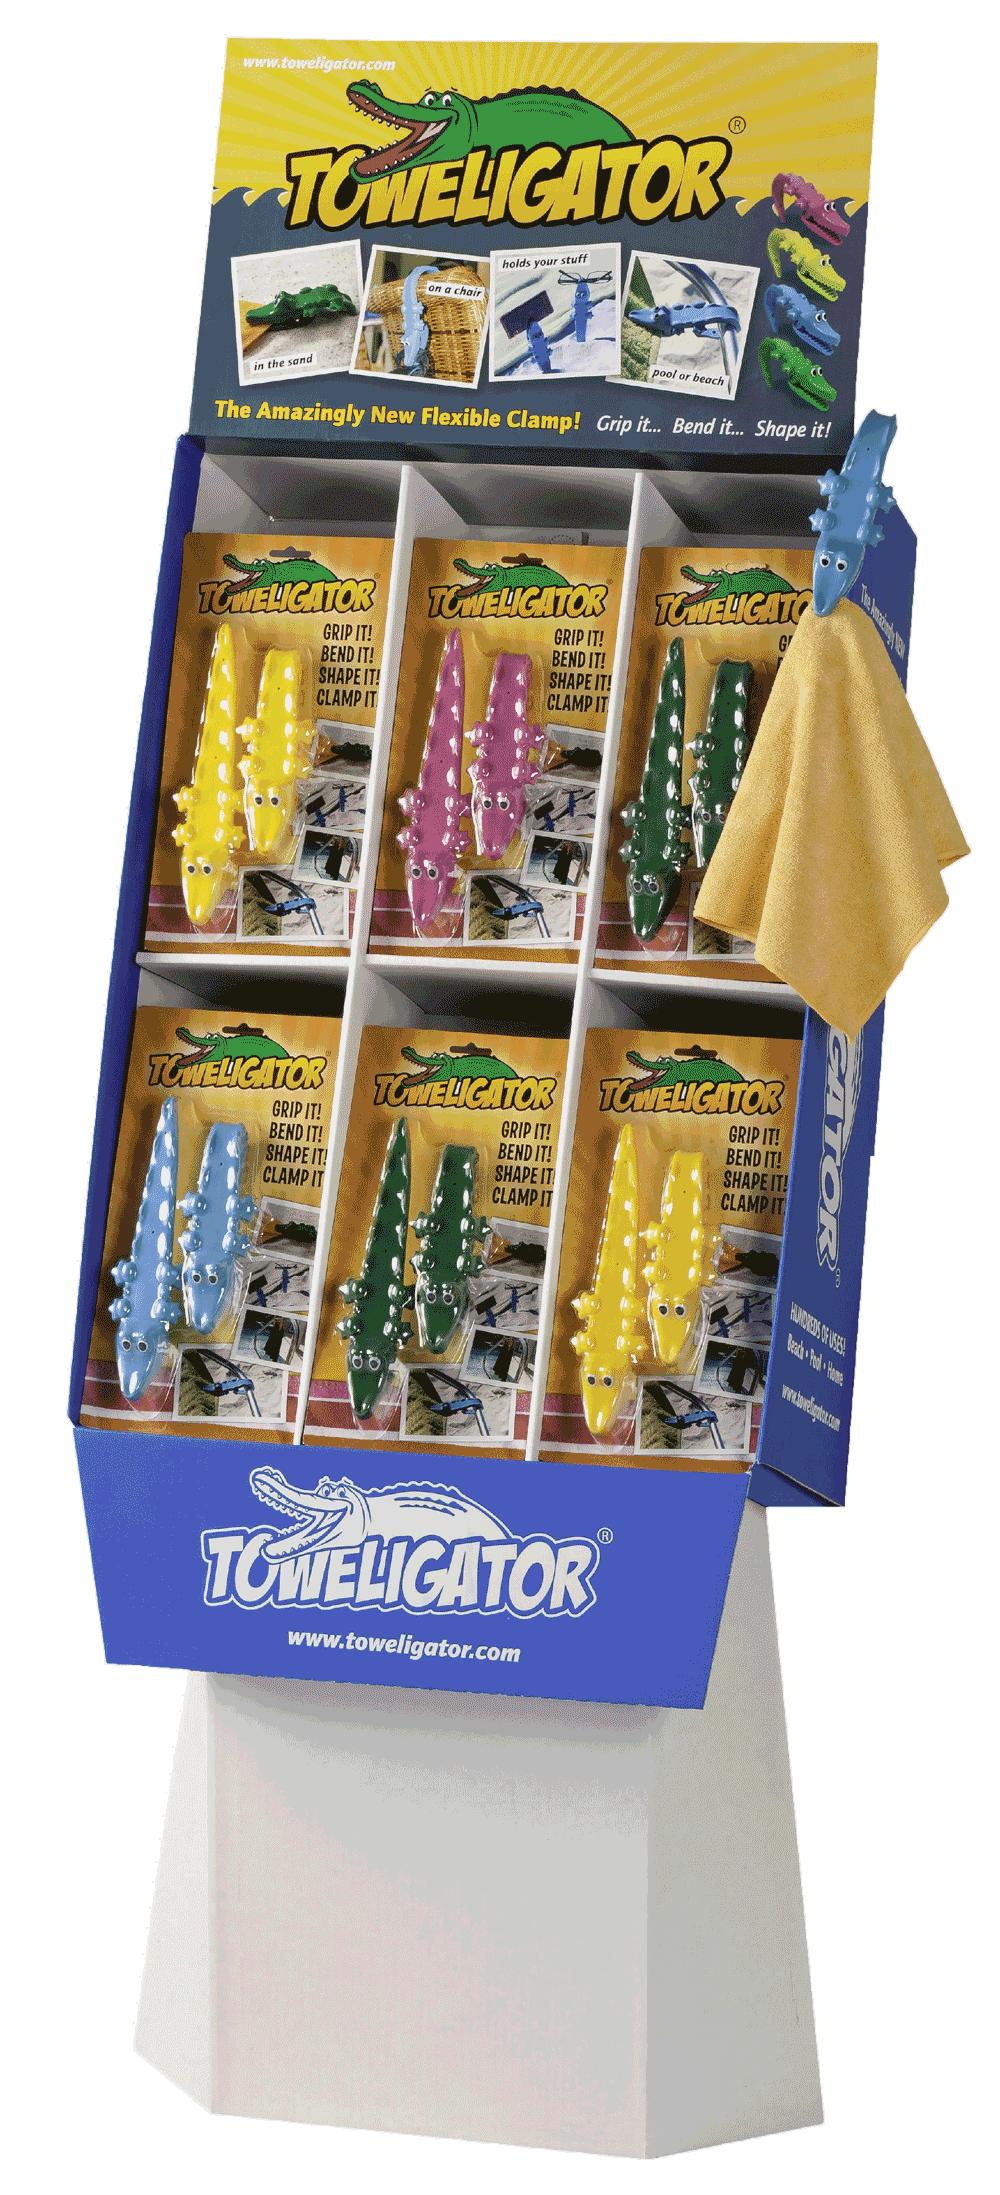 toweligator stand